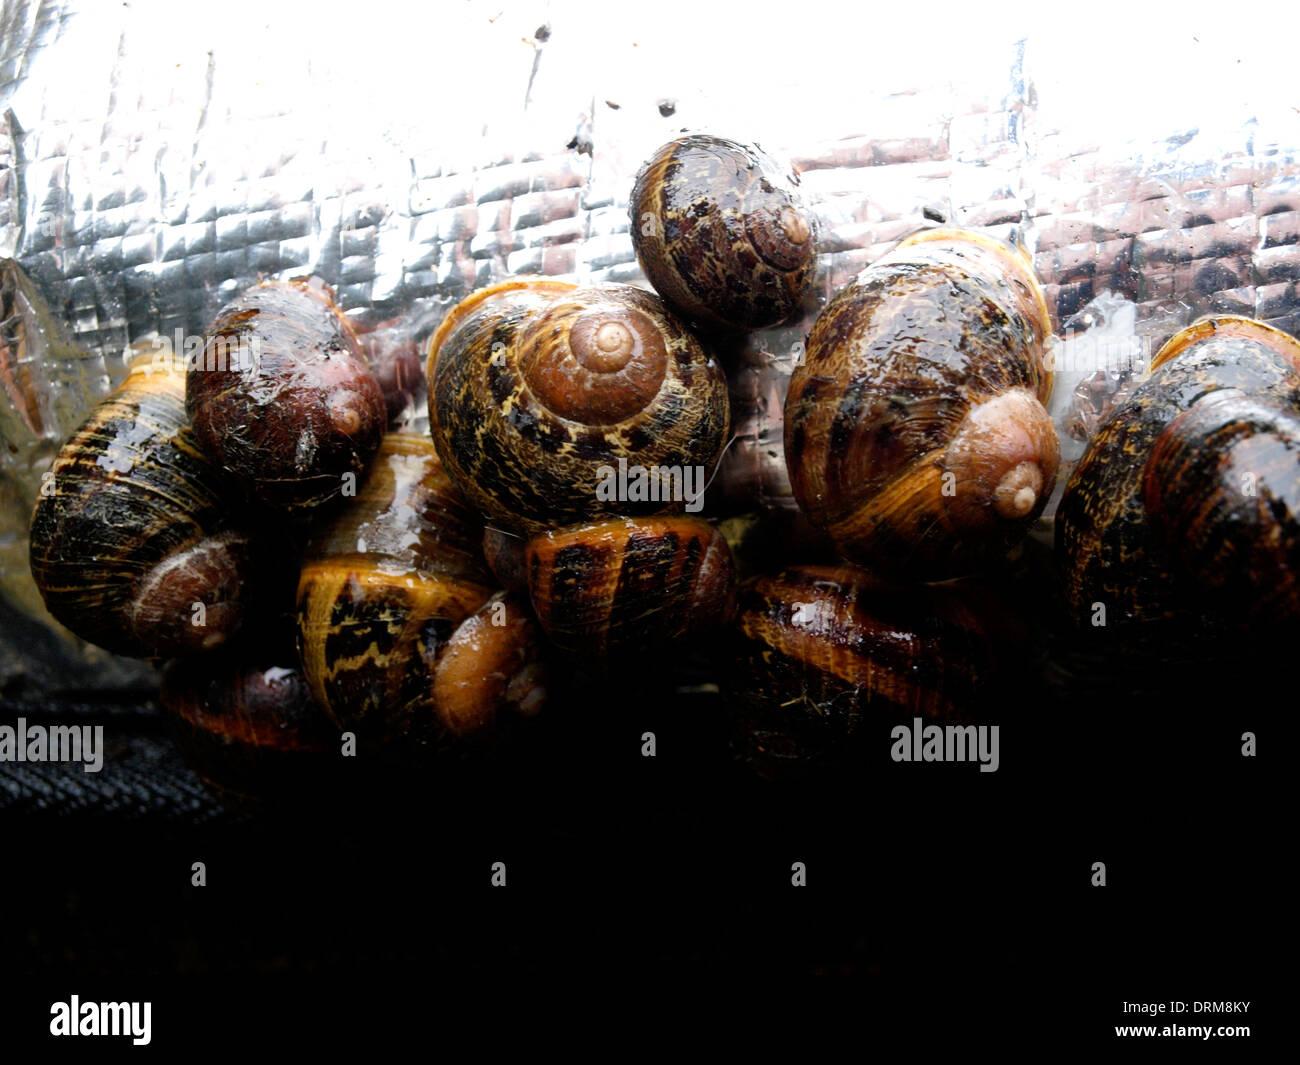 Garden snails hibernating during winter, UK - Stock Image